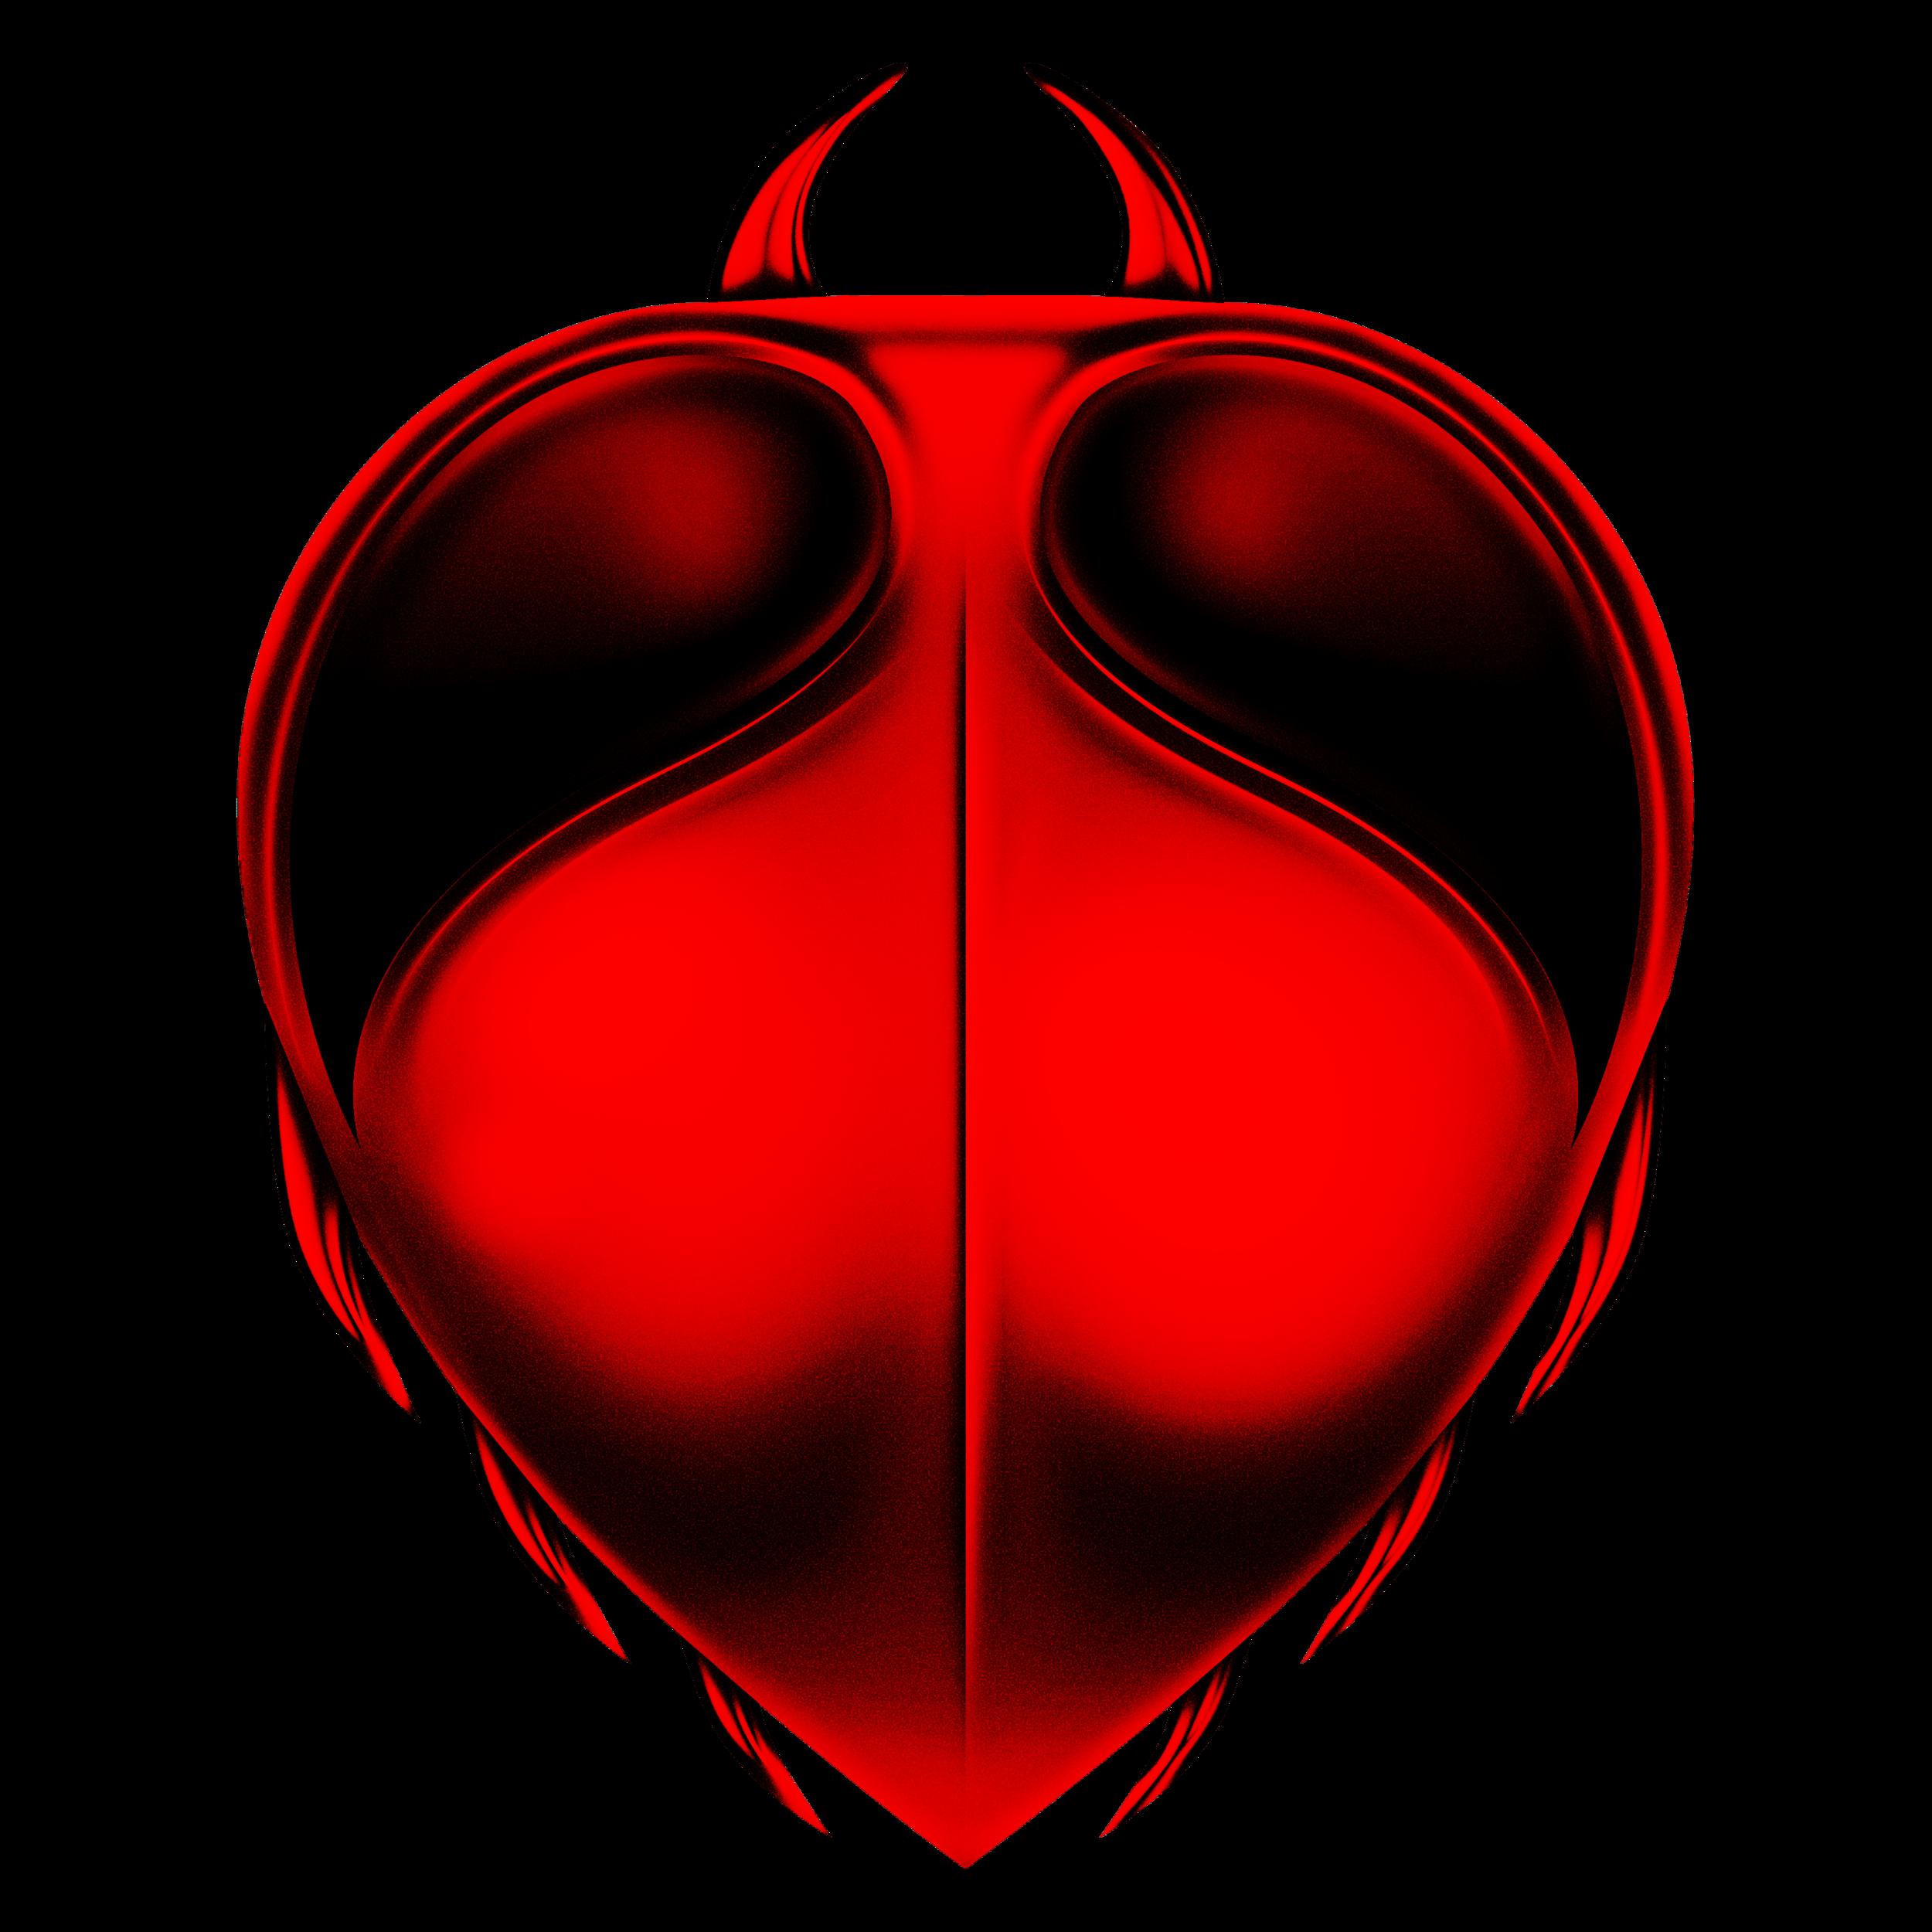 Thumper_icon_alpha_hirez.png